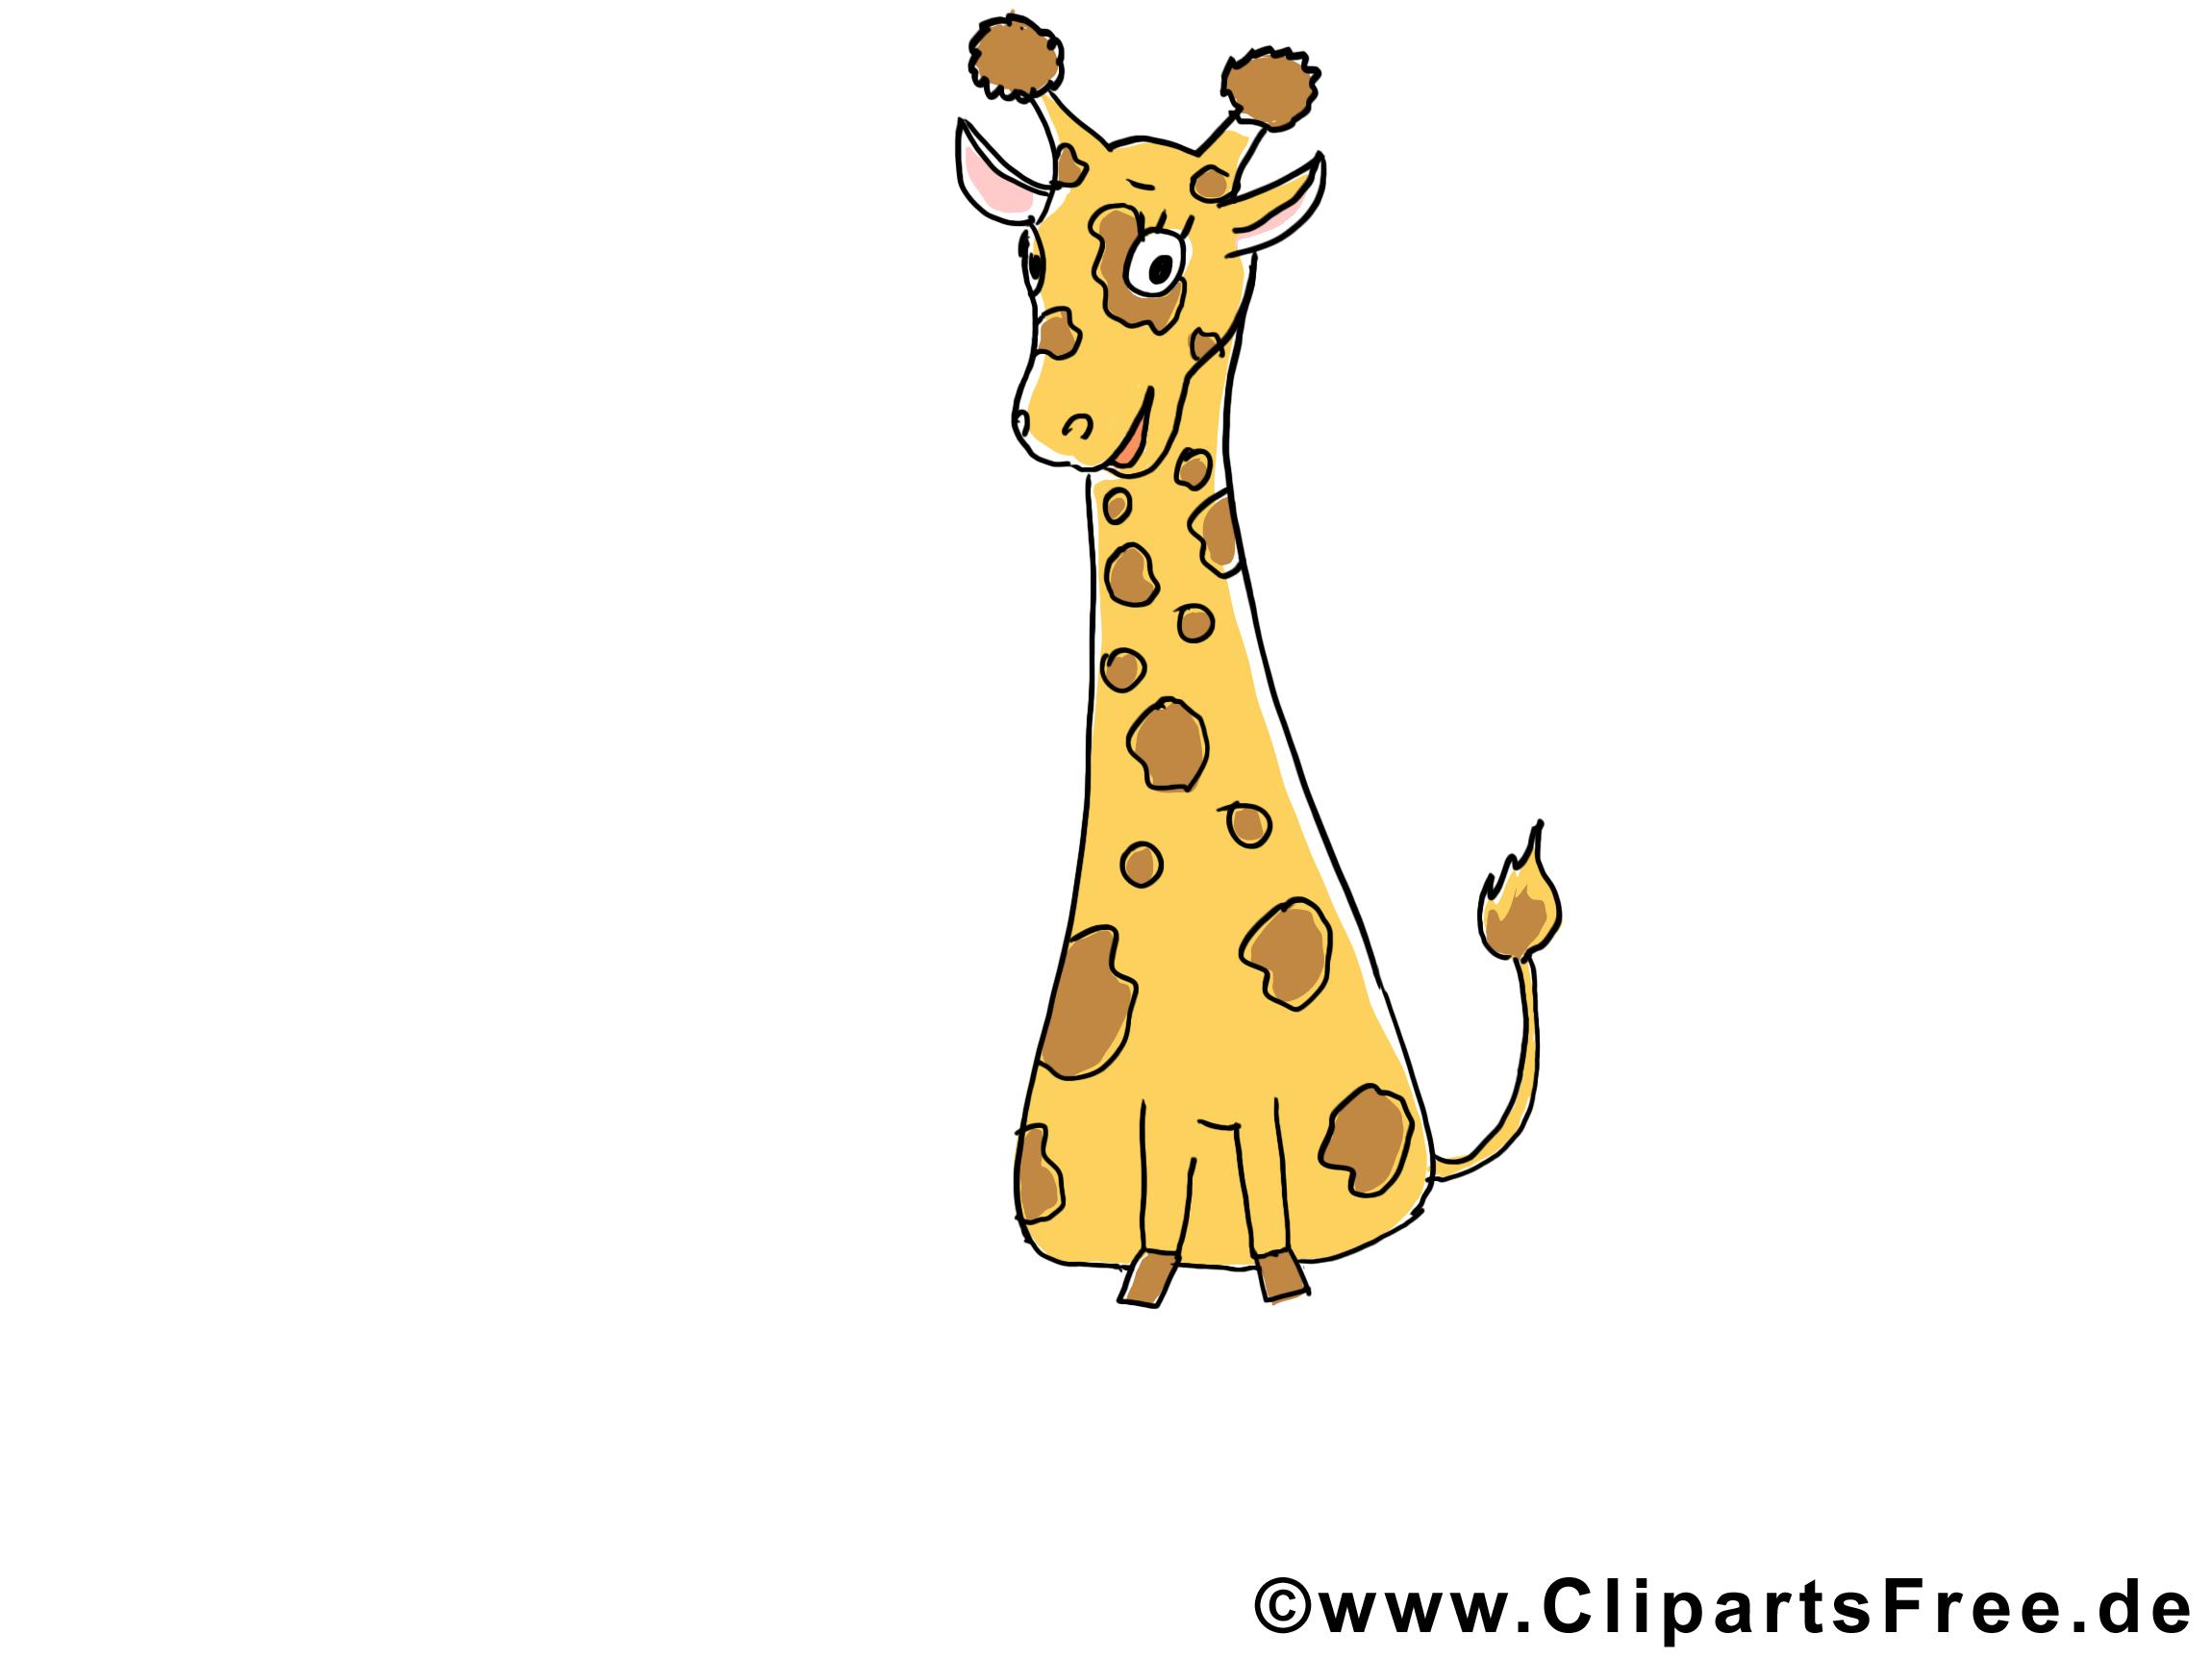 Giraffe Clipart - Cliparts Zoo